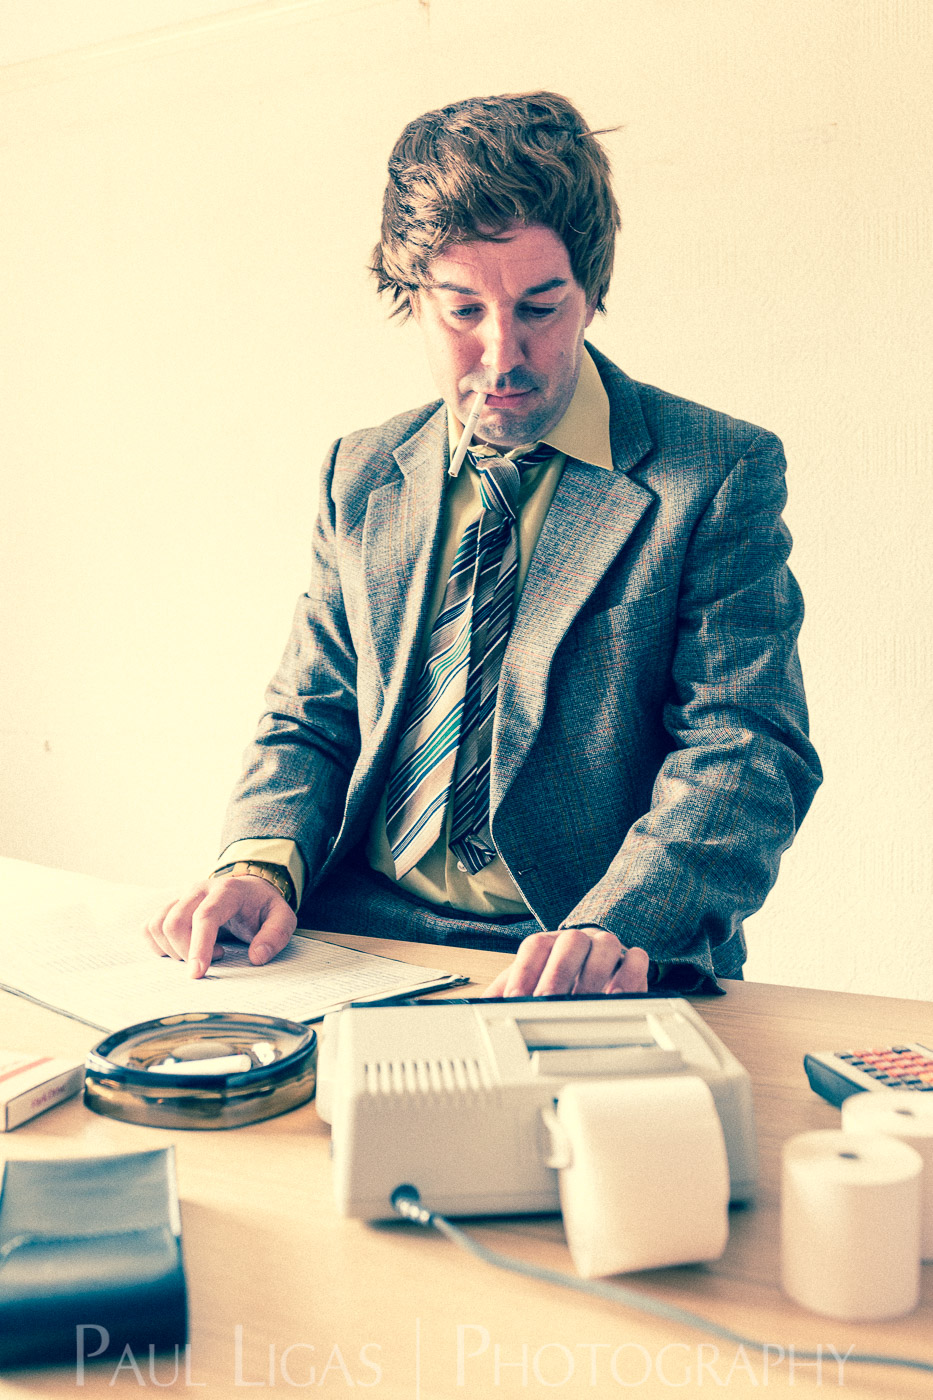 Cogs Accountancy Services - Portrait Photographer Herefordshire 7799